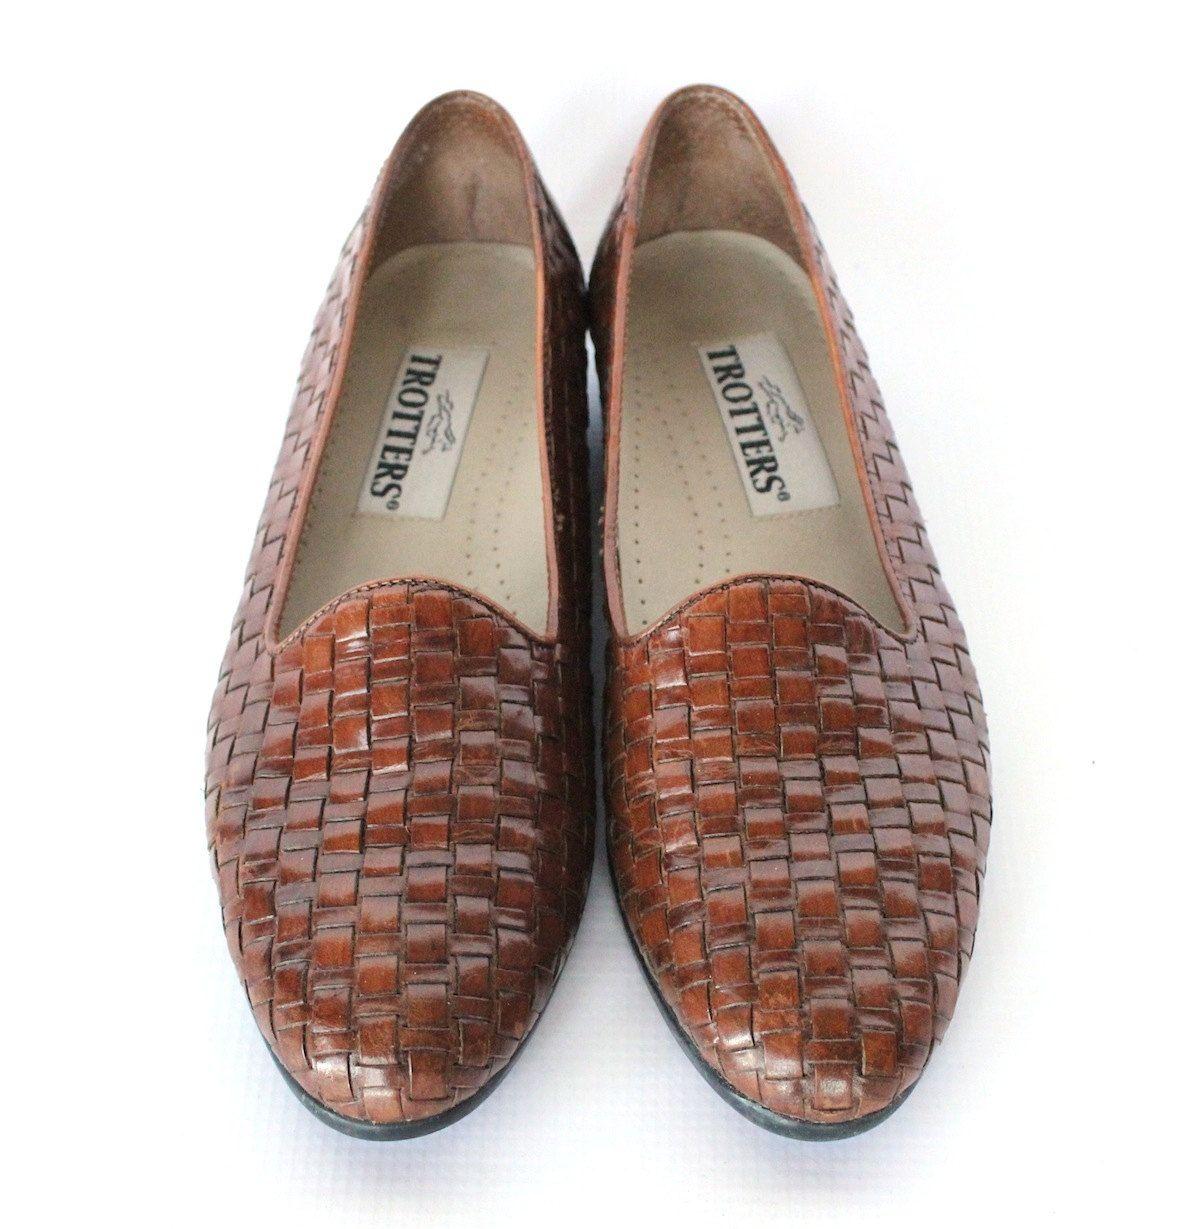 fbfdbe7a6f242 Vintage 80s Warm Brown Woven Leather Flats // Women's Flat Loafer Sz ...